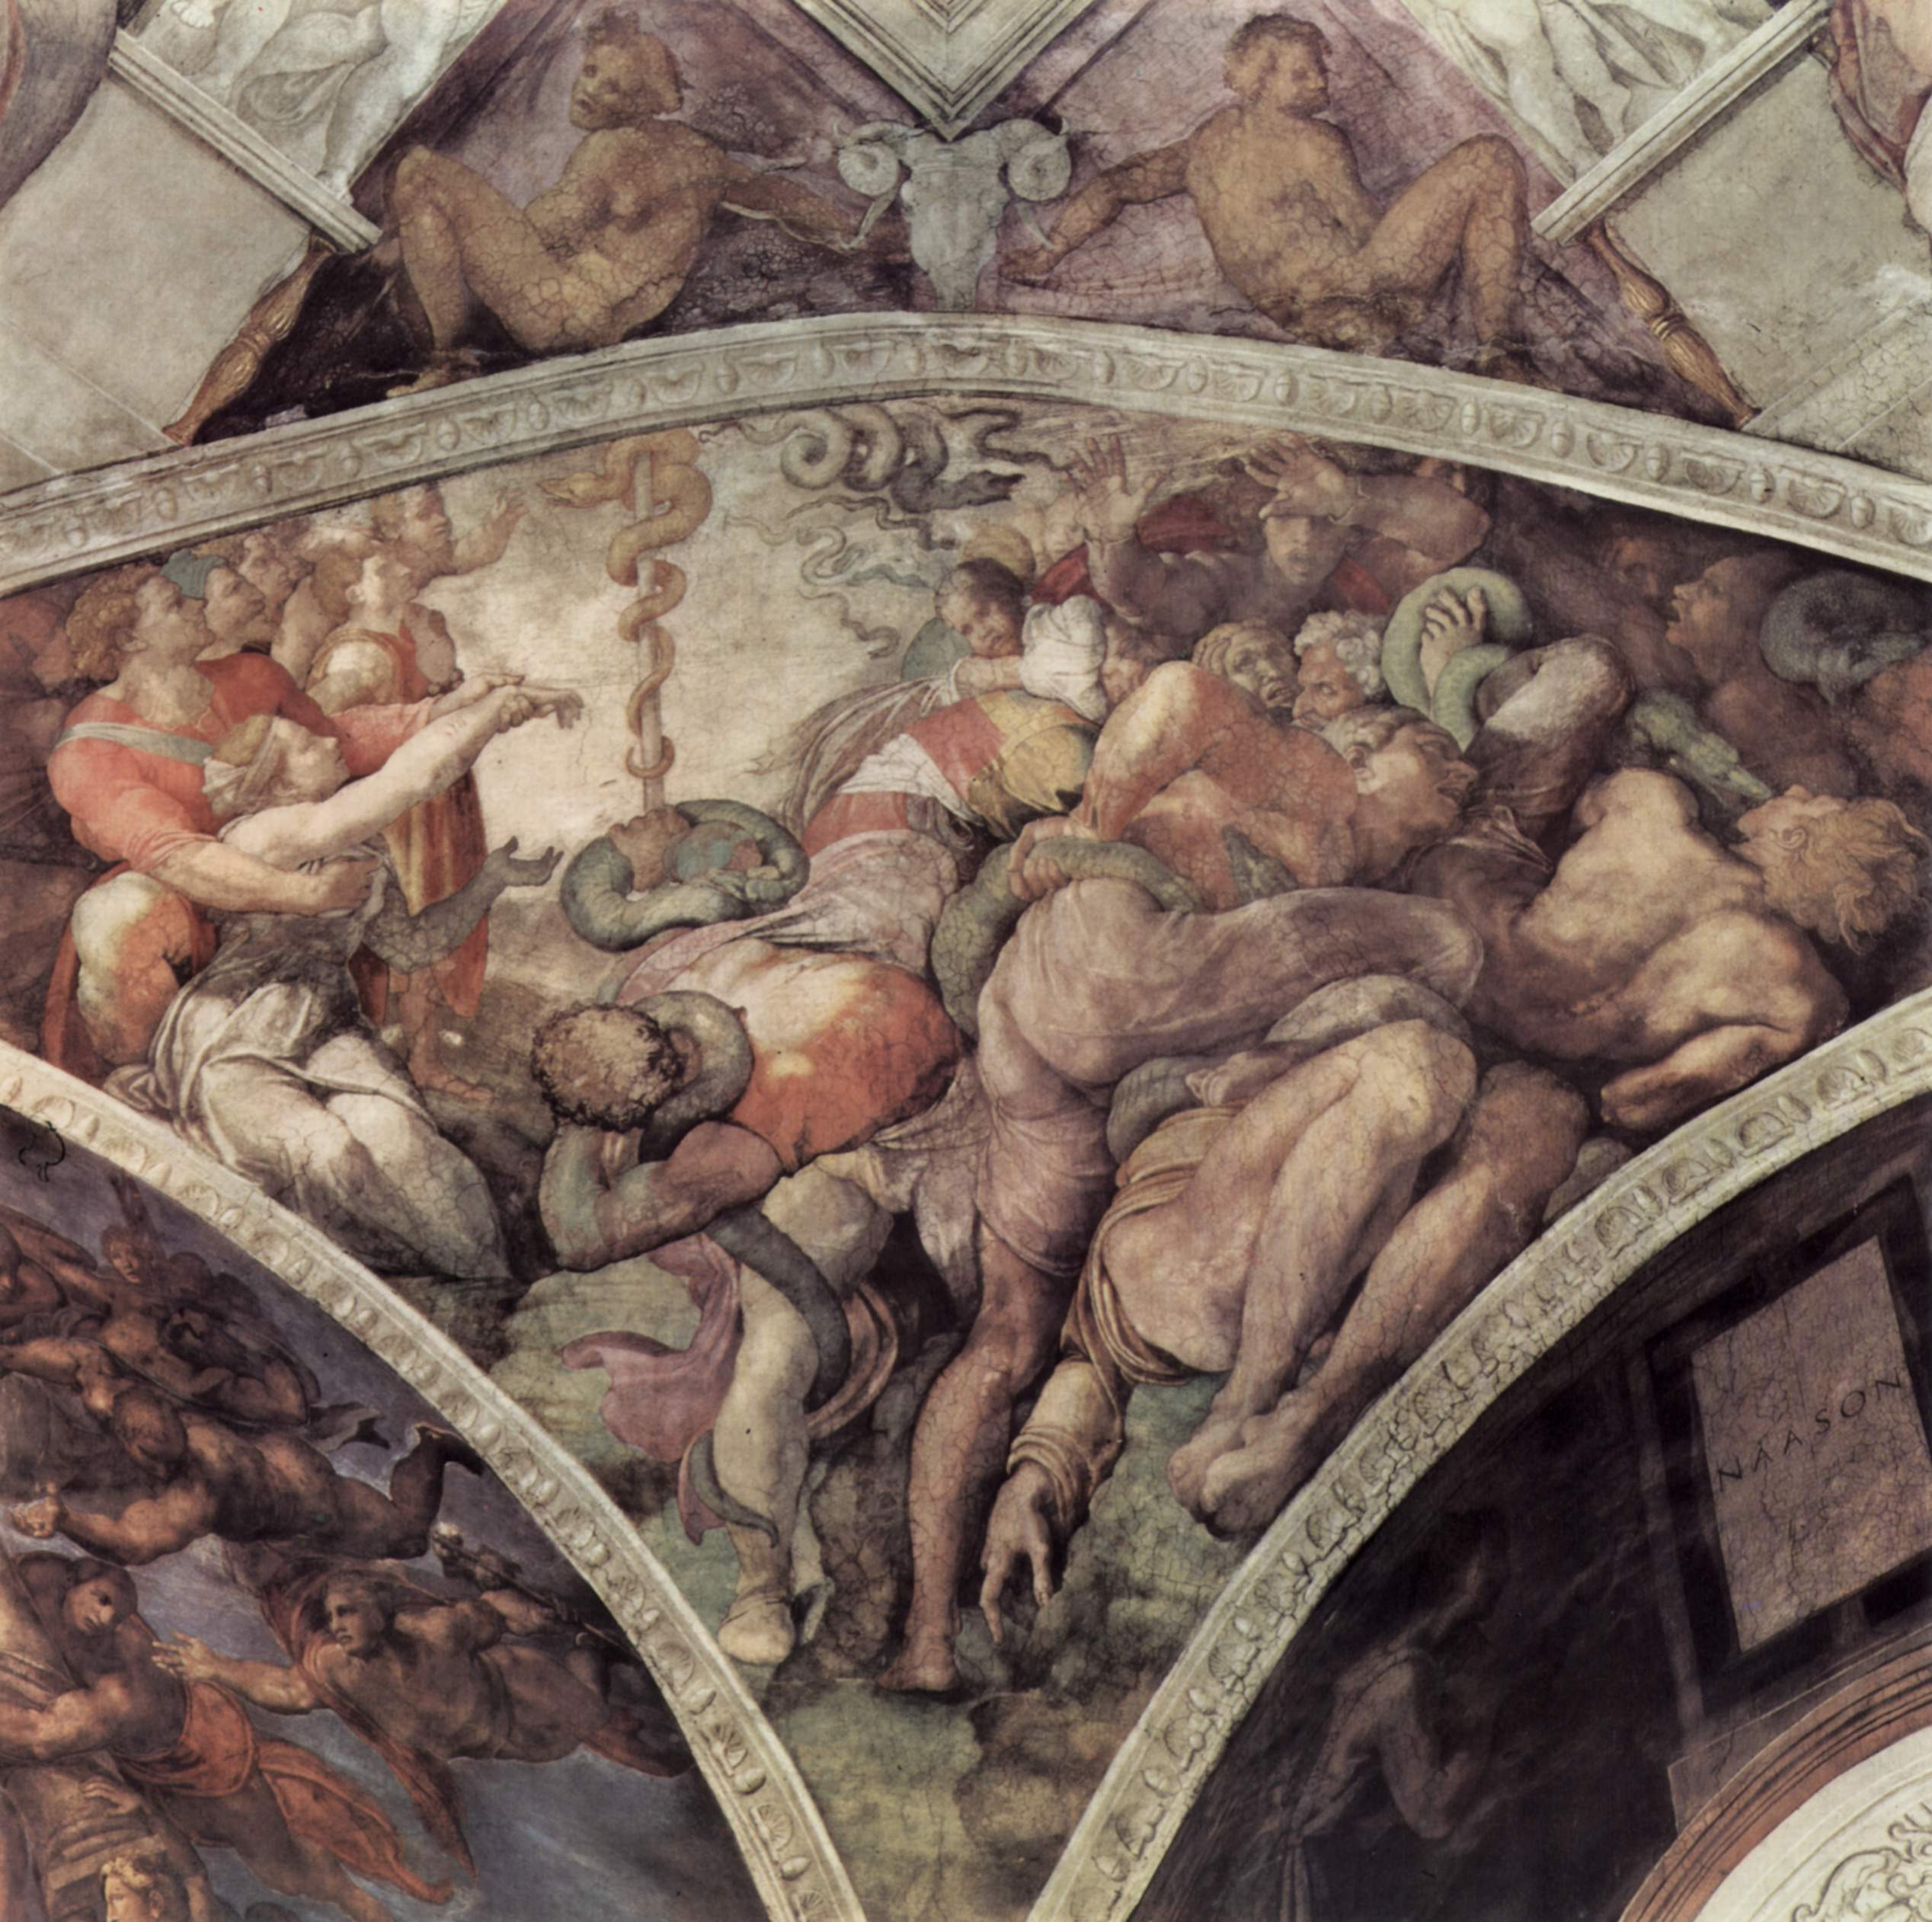 Filemichelangelo Buonarroti 024g Wikimedia Commons